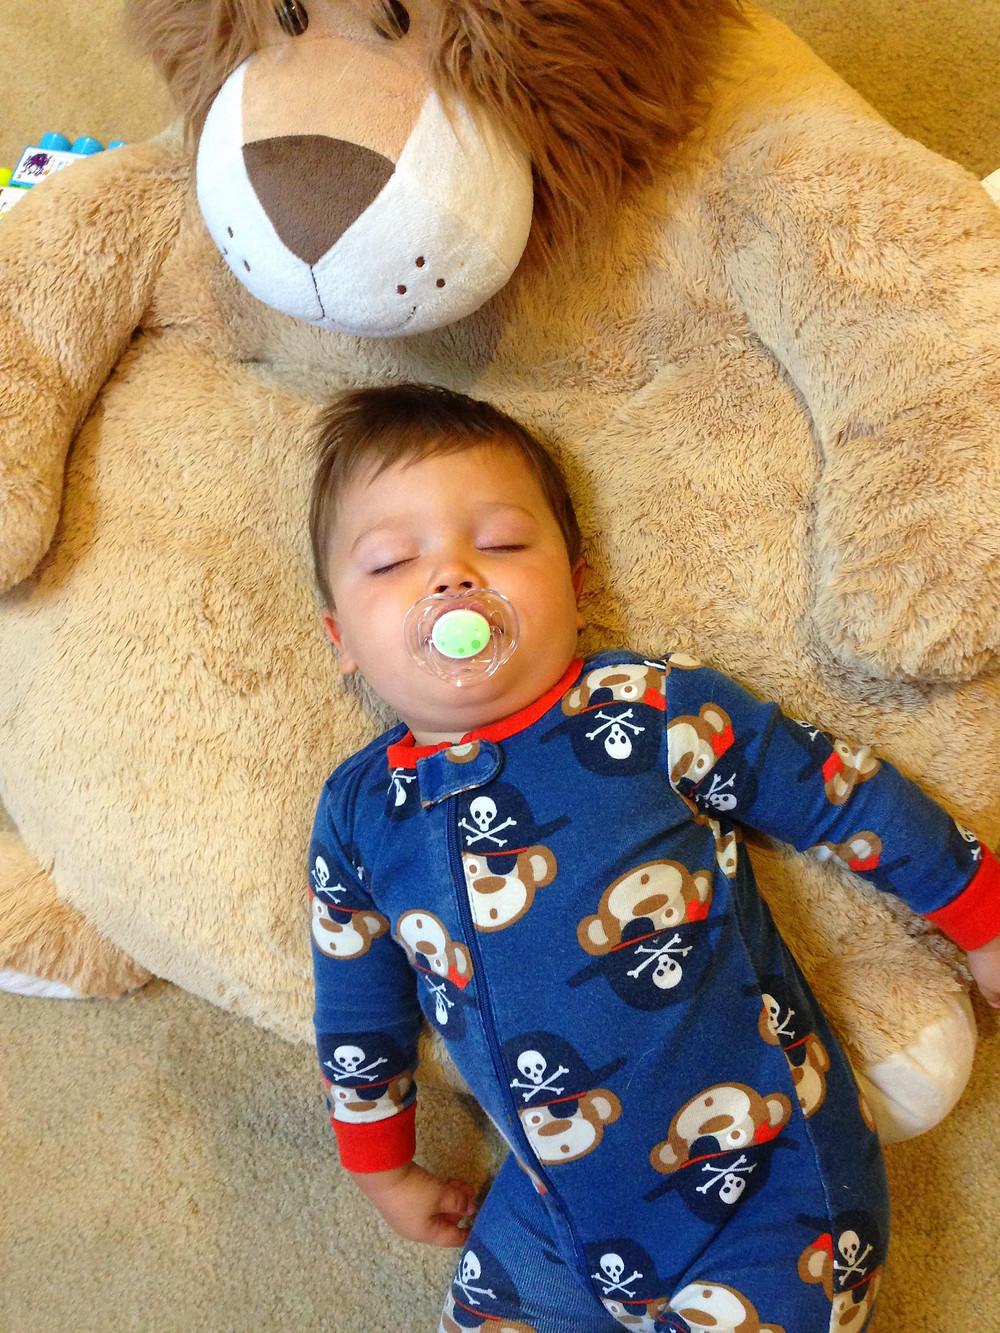 Born Happy, Nashville, TN, Baby Sleep Coach, Toddler Sleep Coach, Parenting Coach, Natrual Treatment, Flu Influenza, Elderberry